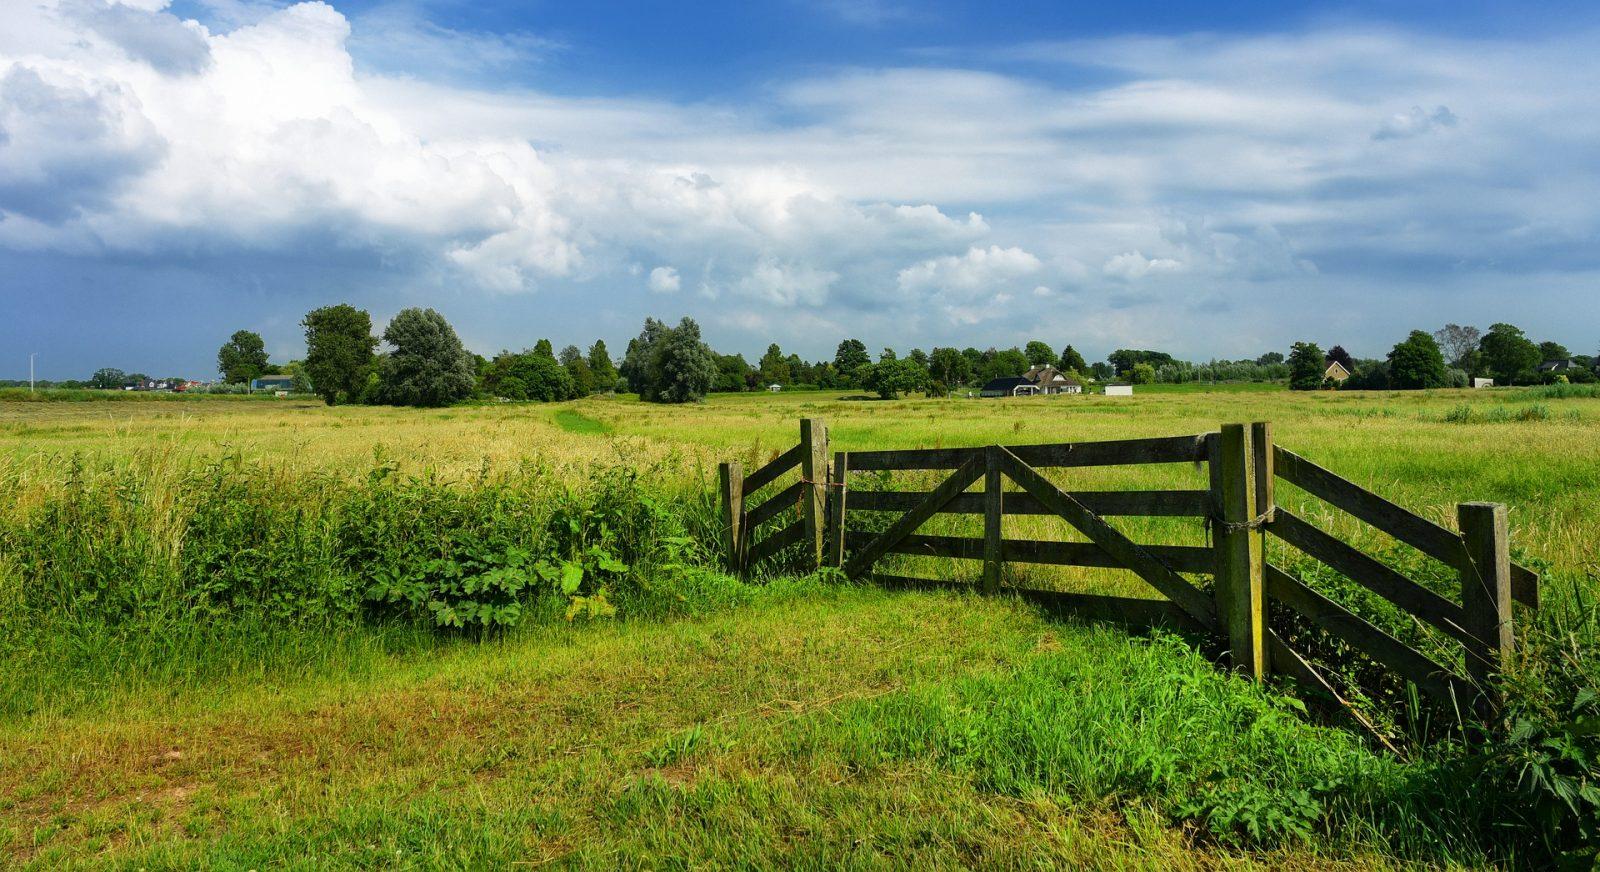 Soil, Water, Atmosphere at Wageningen University & Research – WUT - Wageningen University & Research – WUR - Informacje o kierunku